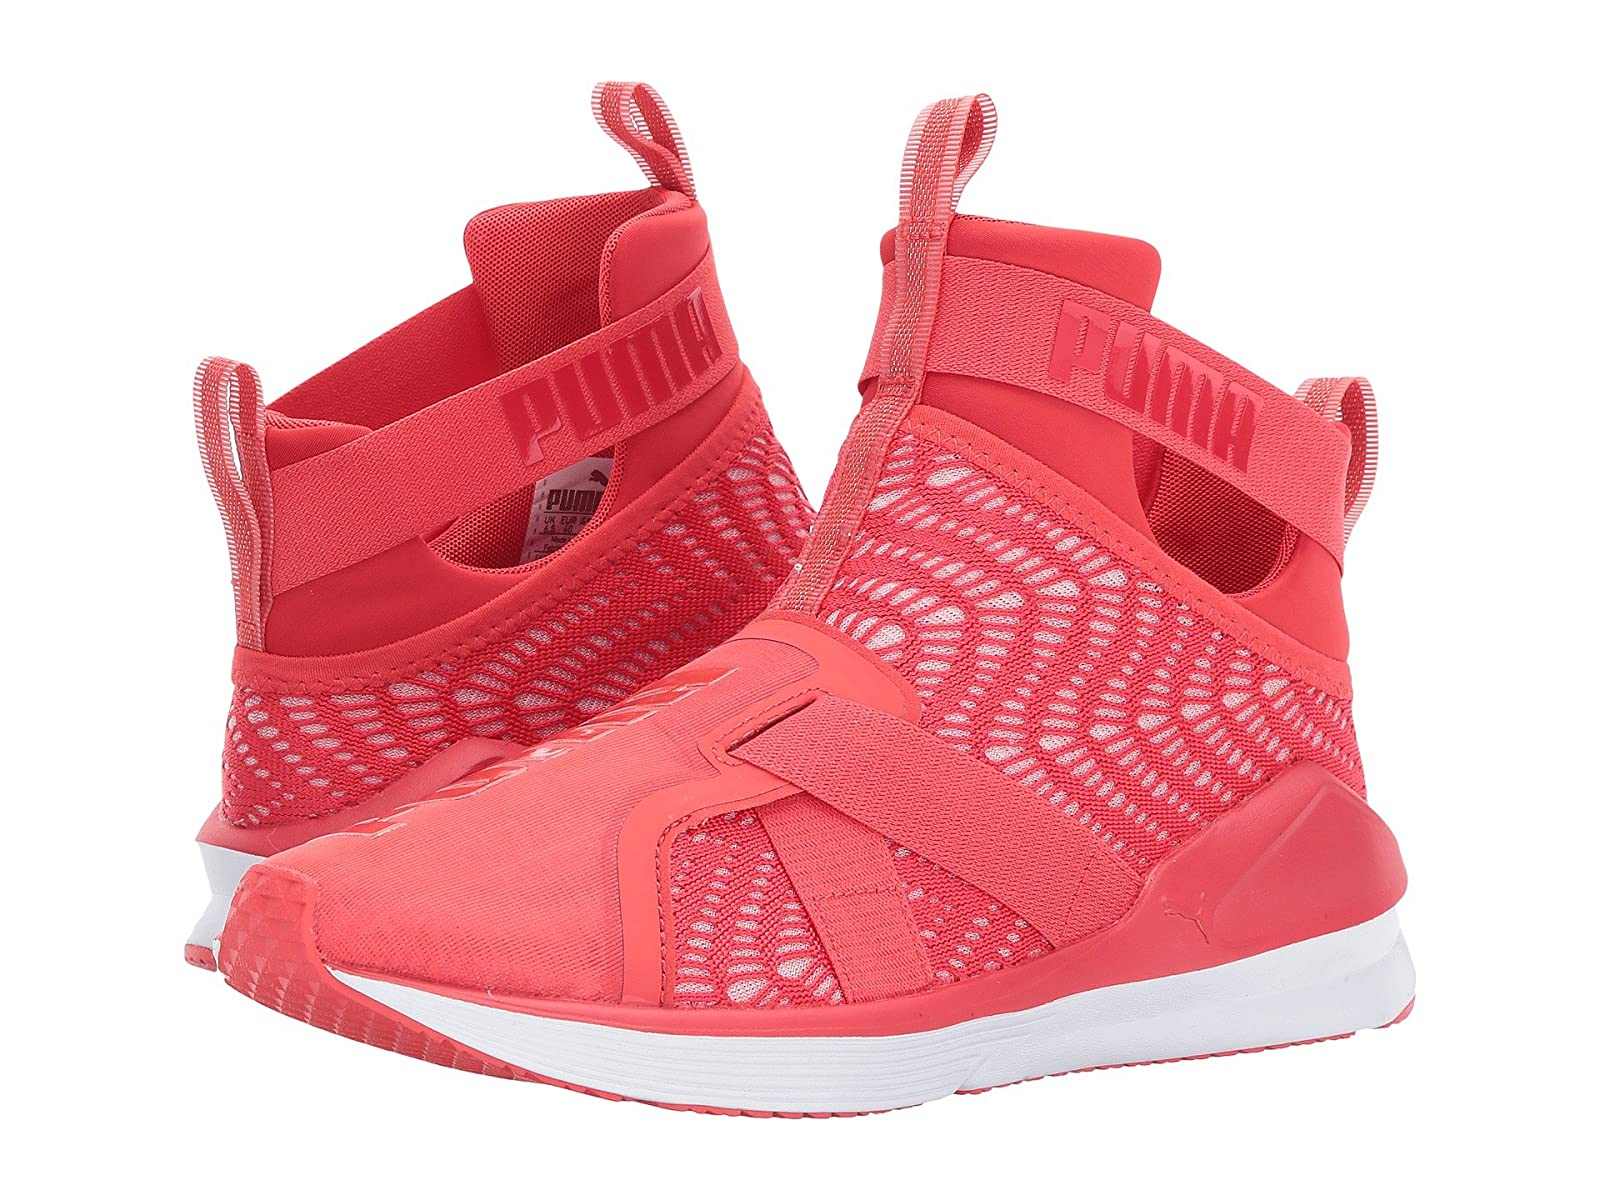 PUMA Fierce Strap SwirlCheap and distinctive eye-catching shoes